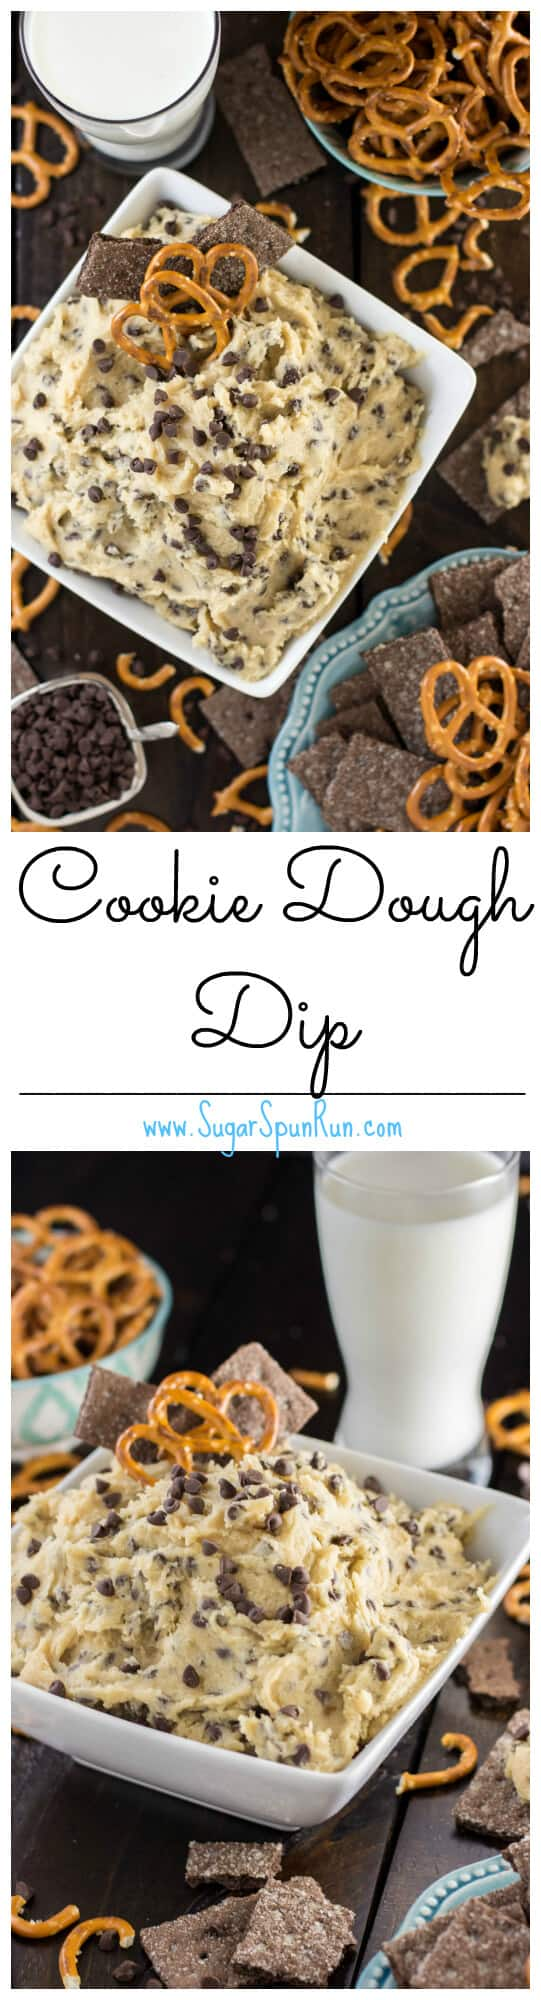 Cookie Dough Dip - Sugar Spun Run